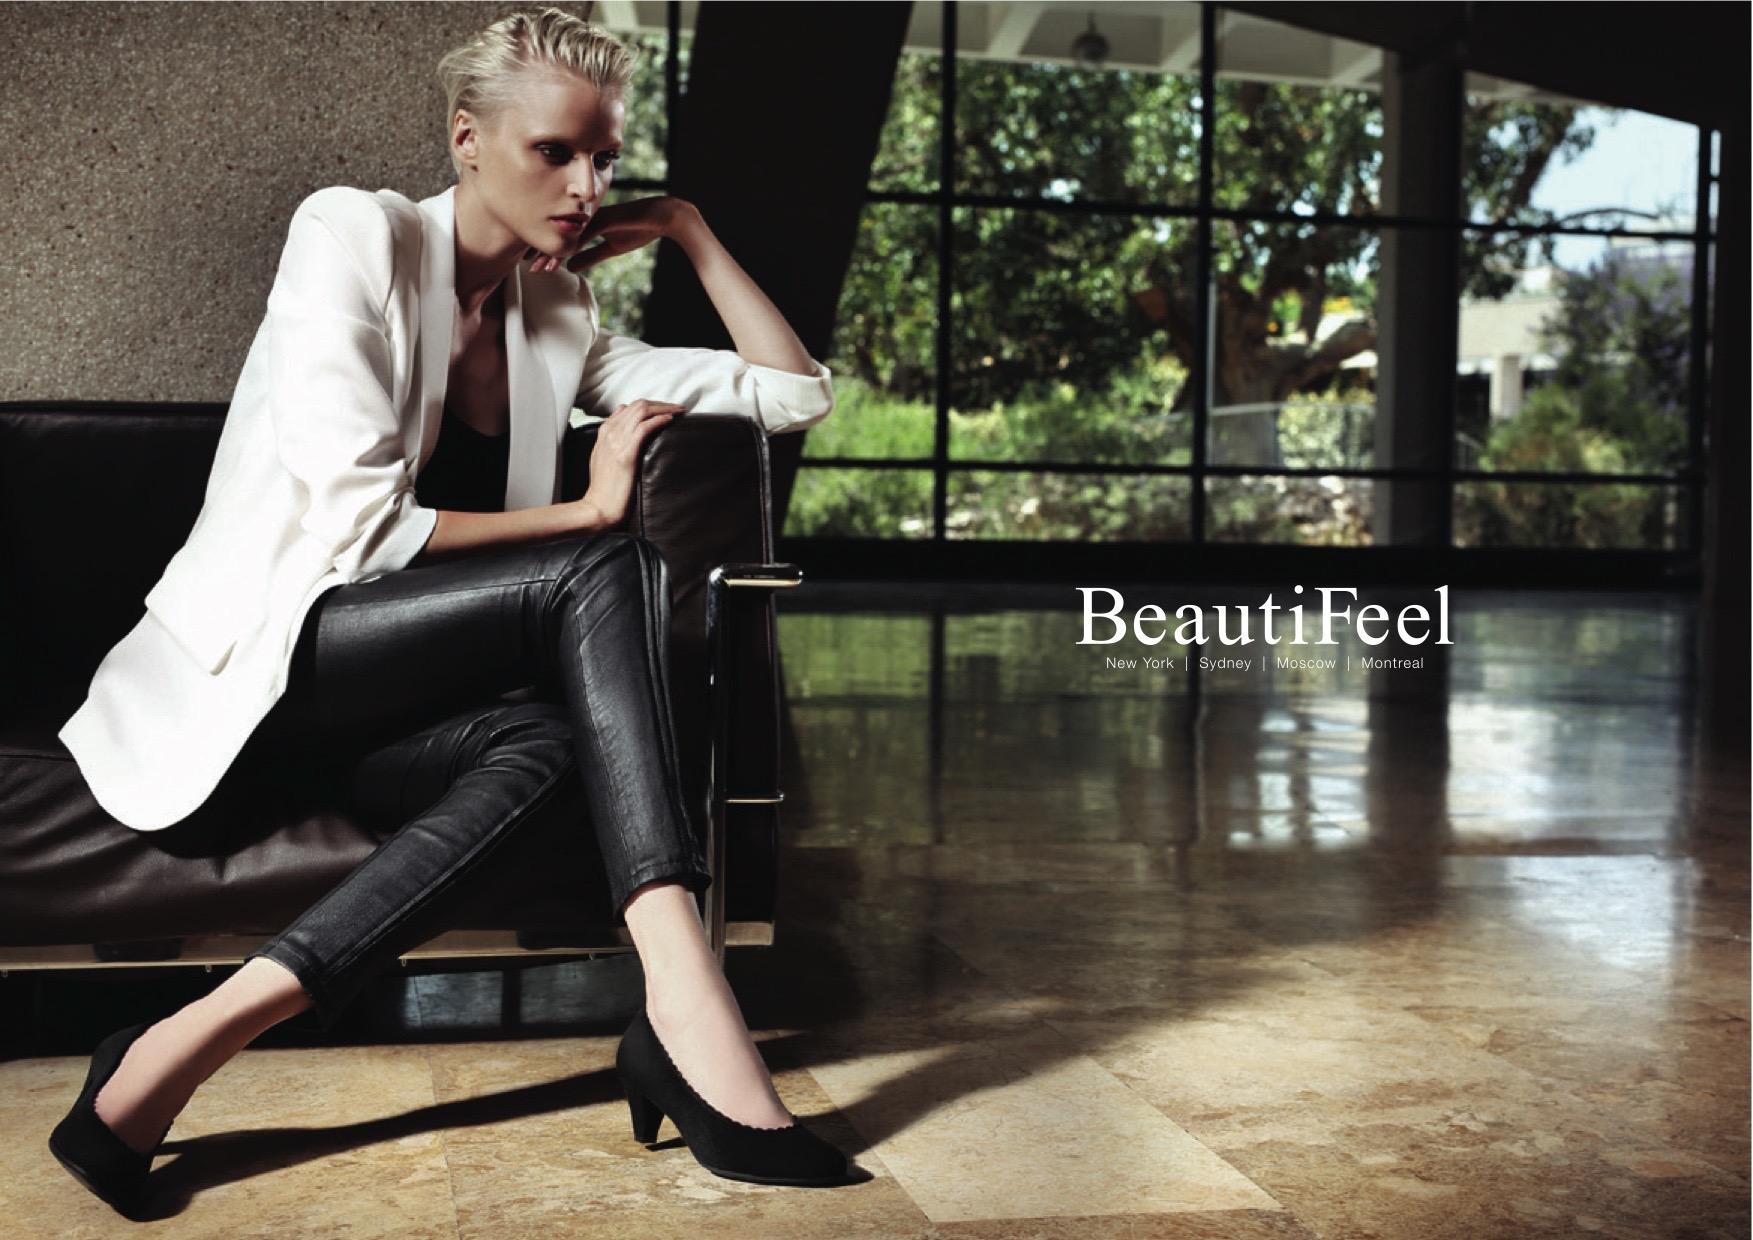 beautiful feel ad.jpeg